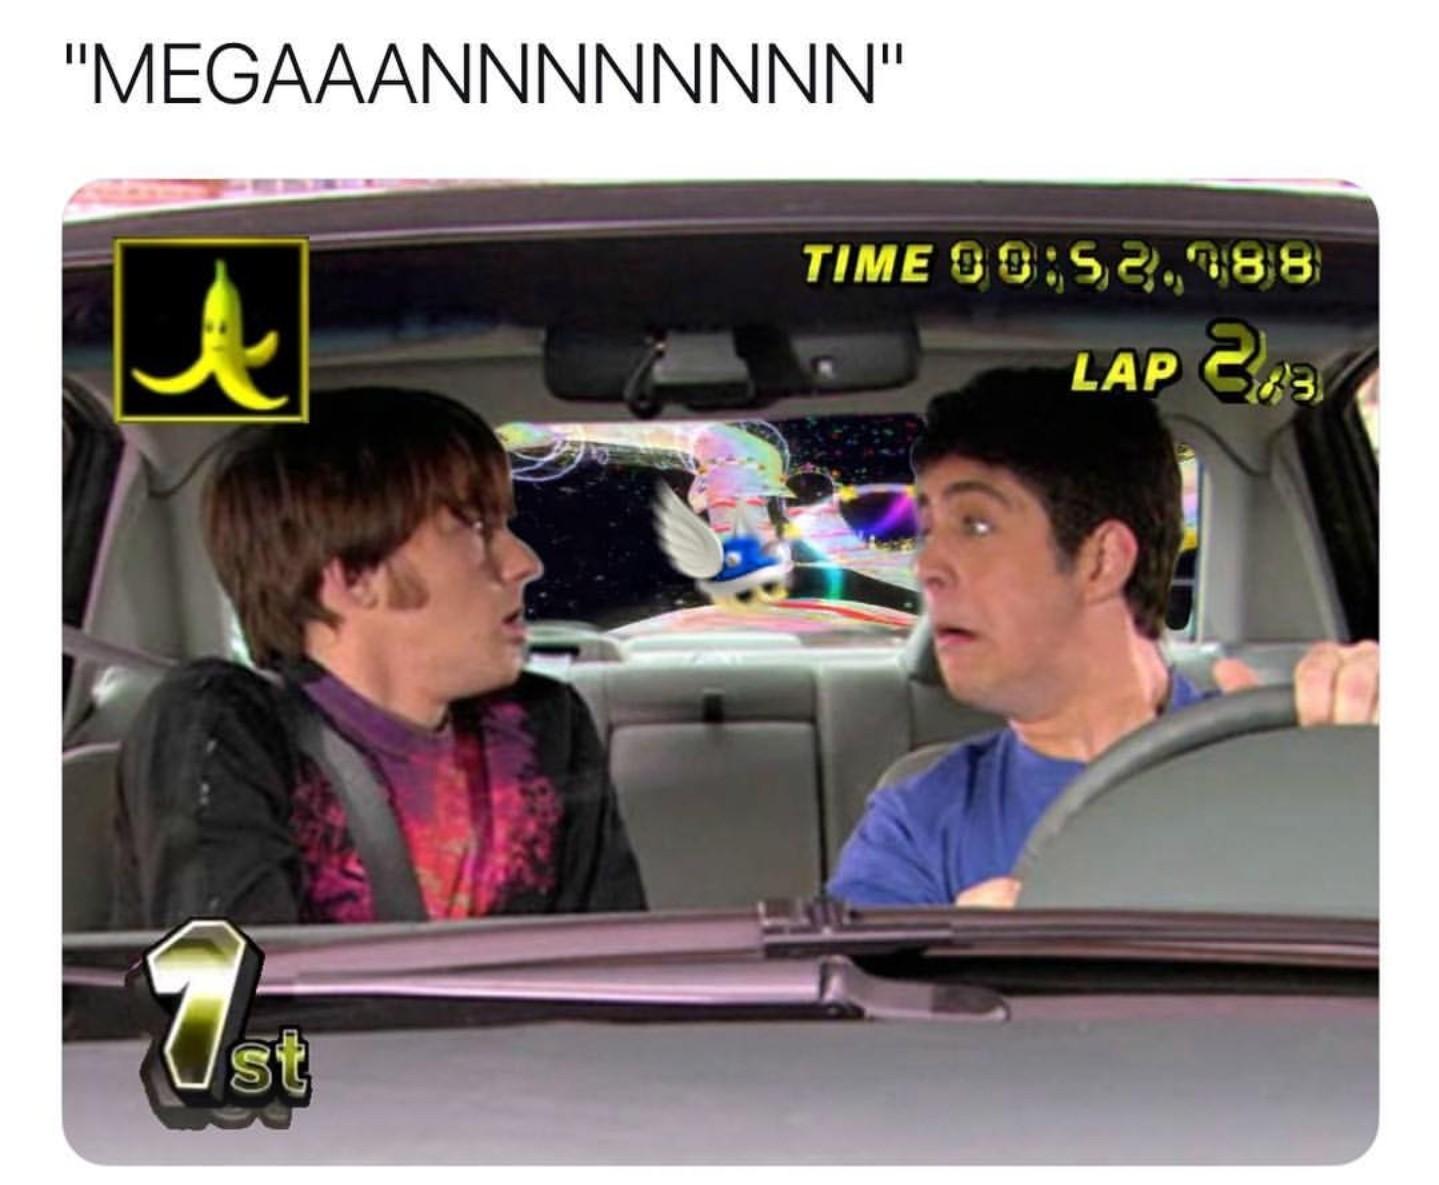 Boop - meme